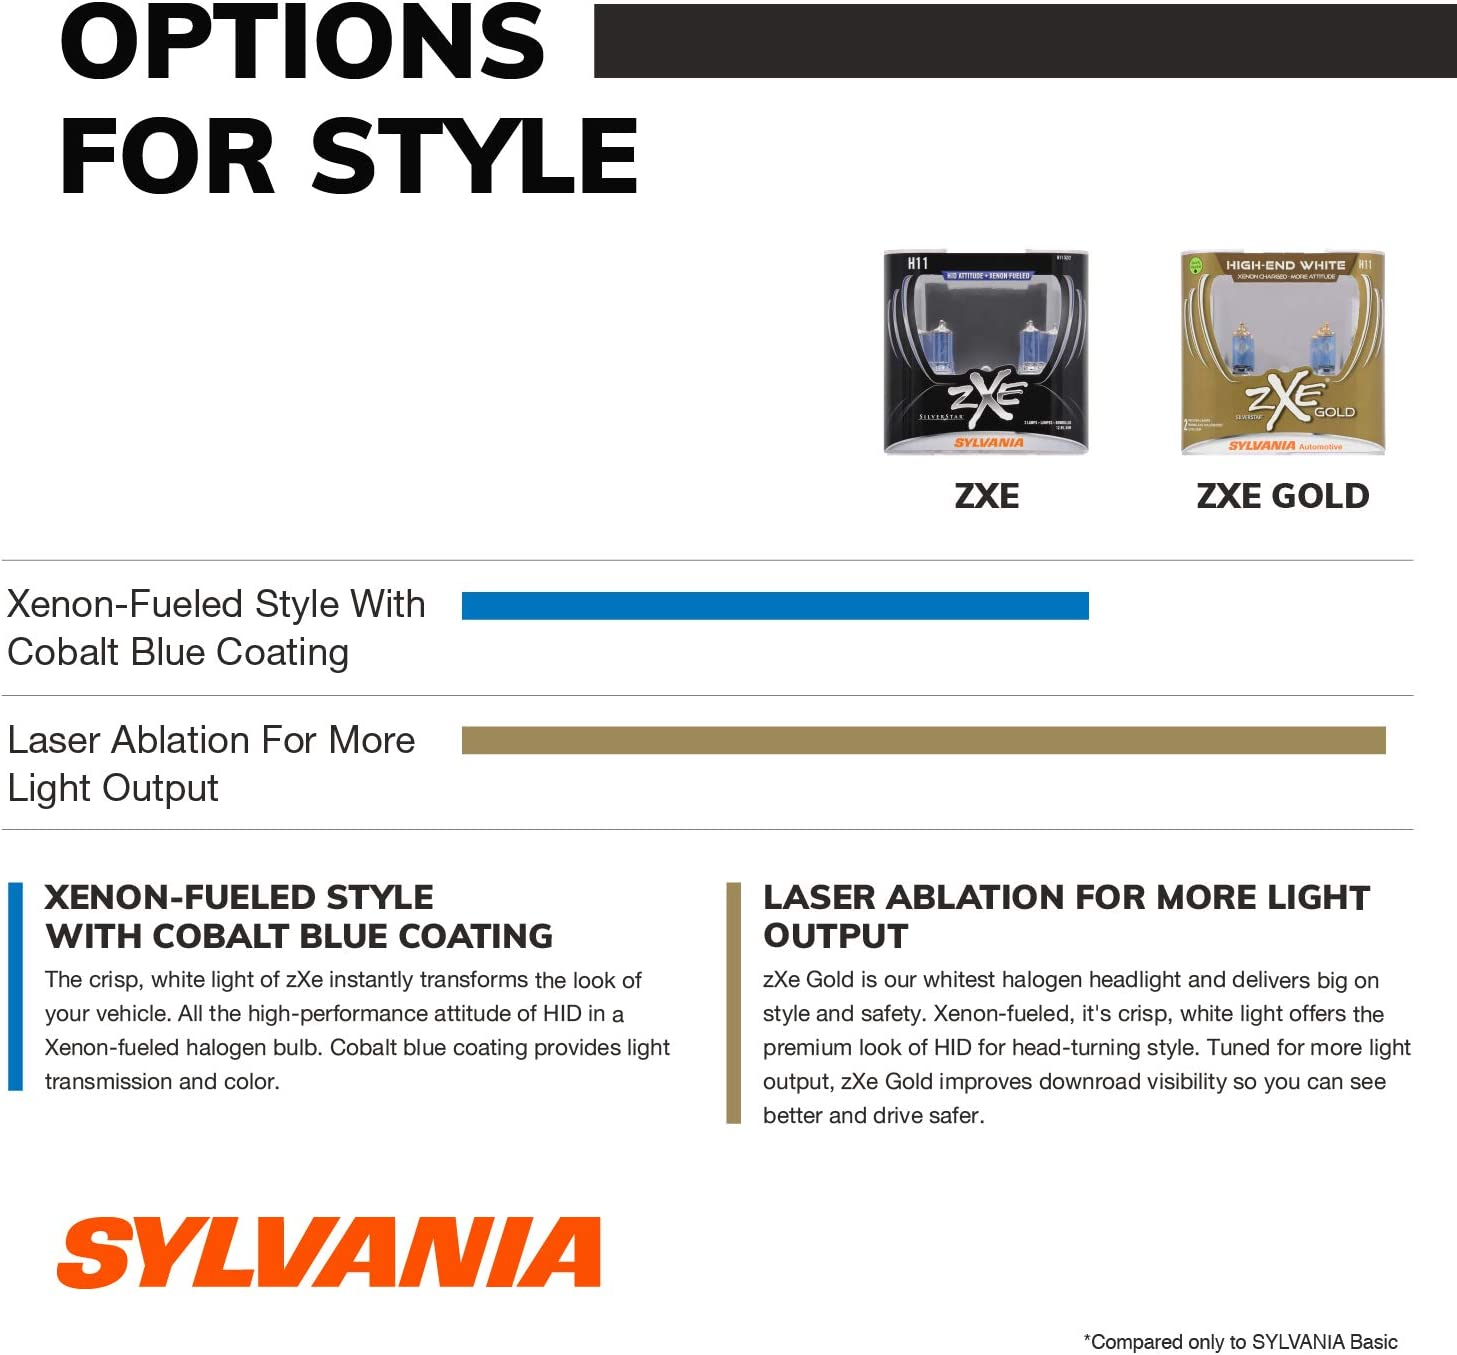 Sylvania Silverstar ZXE 9006XS Pair Set Headlight Bulbs Xenon Fueled NEW Sealed